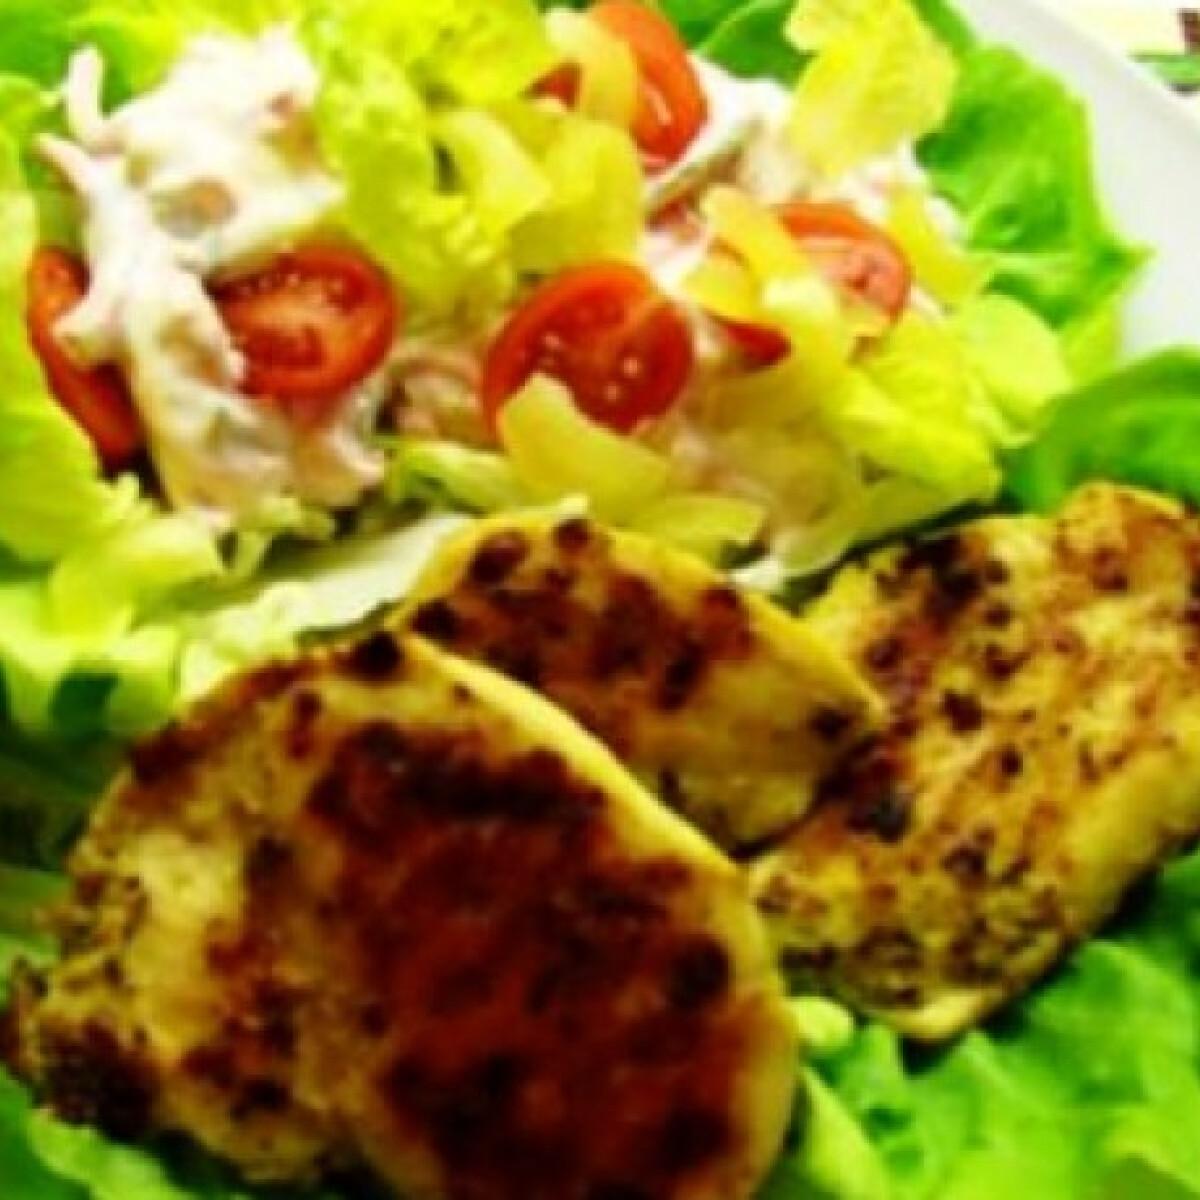 Dijoni mustáros csirkemell grillezve